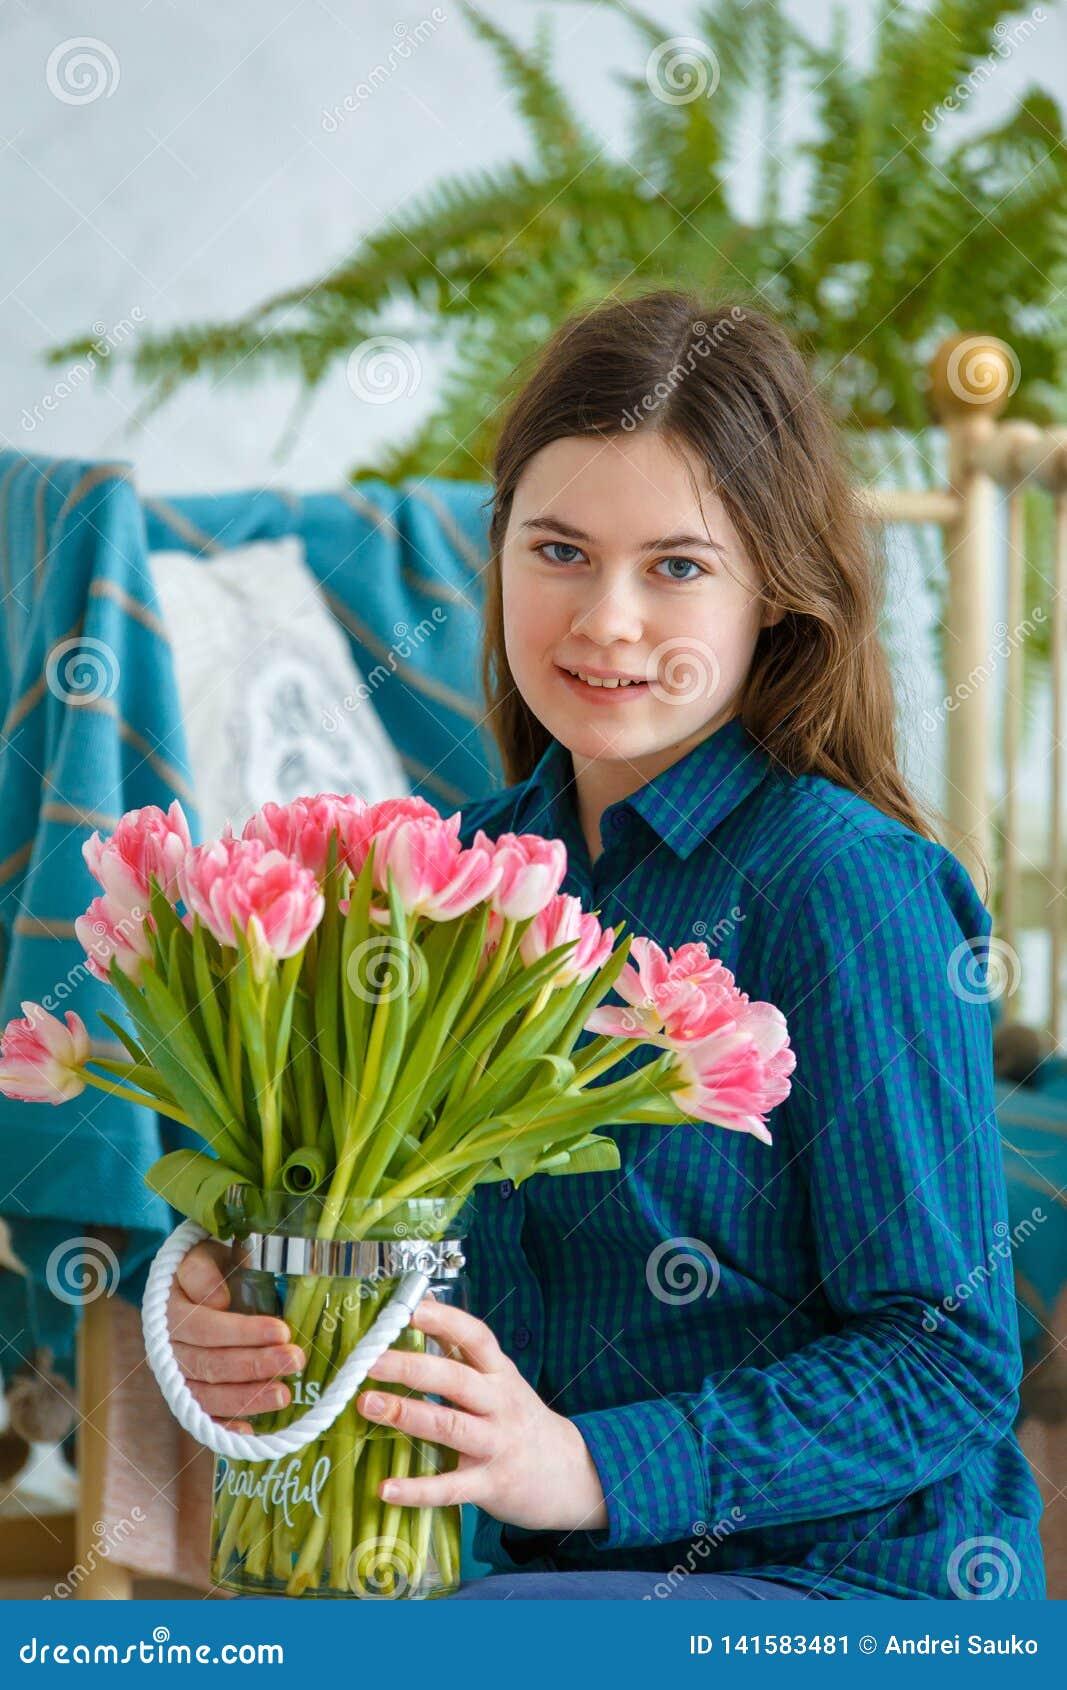 Frühlingsporträt eines Mädchens mit rosa Tulpen